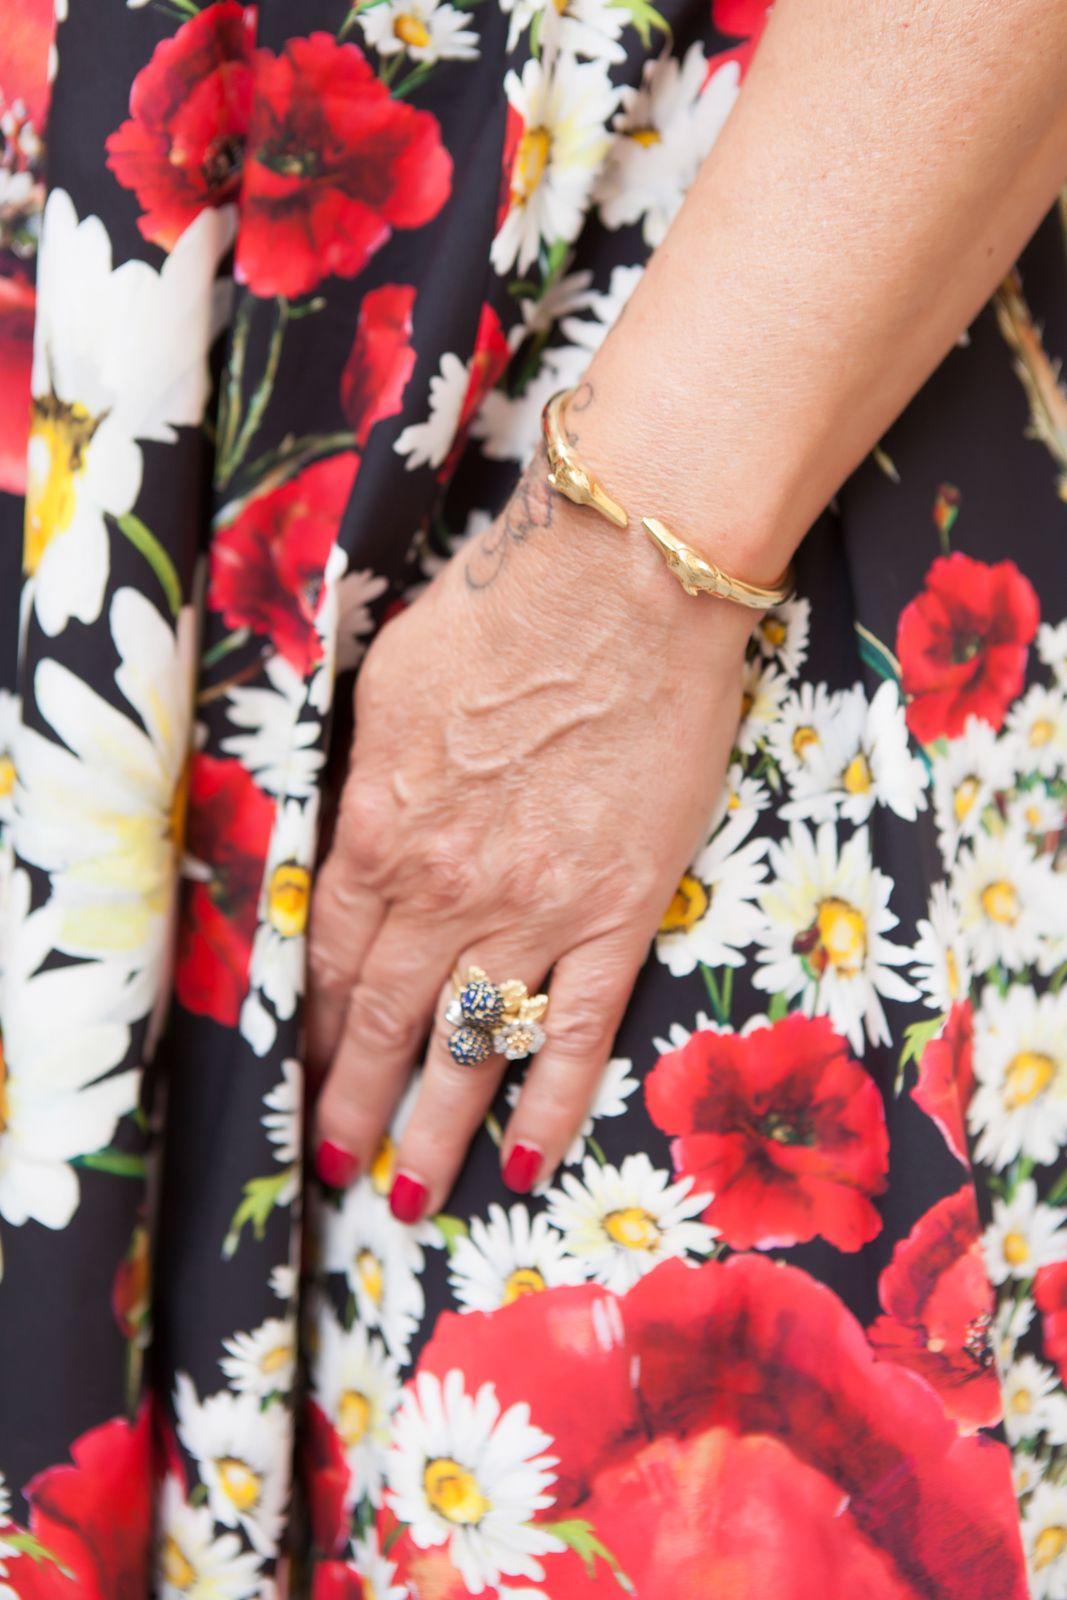 simone mencherini gioielli ring - My dress is a flower garden - illesteva sunglasses, dolce gabbana flower dress, amle earrings, marni sandals. photo shooting in Siena - Not Only Twenty Fashion blog